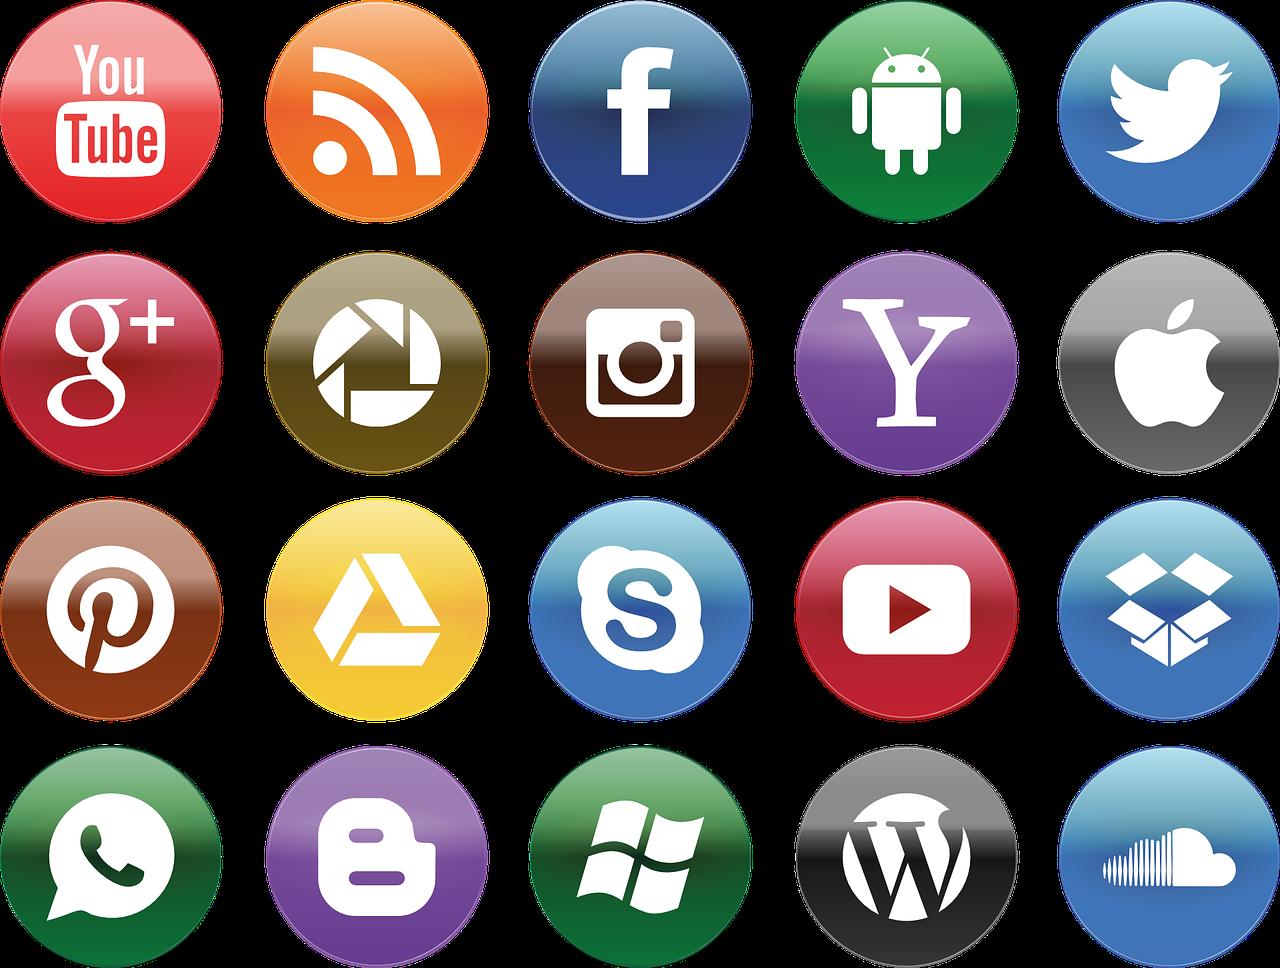 Création d'un site Internet Guyancourt avec WordPress